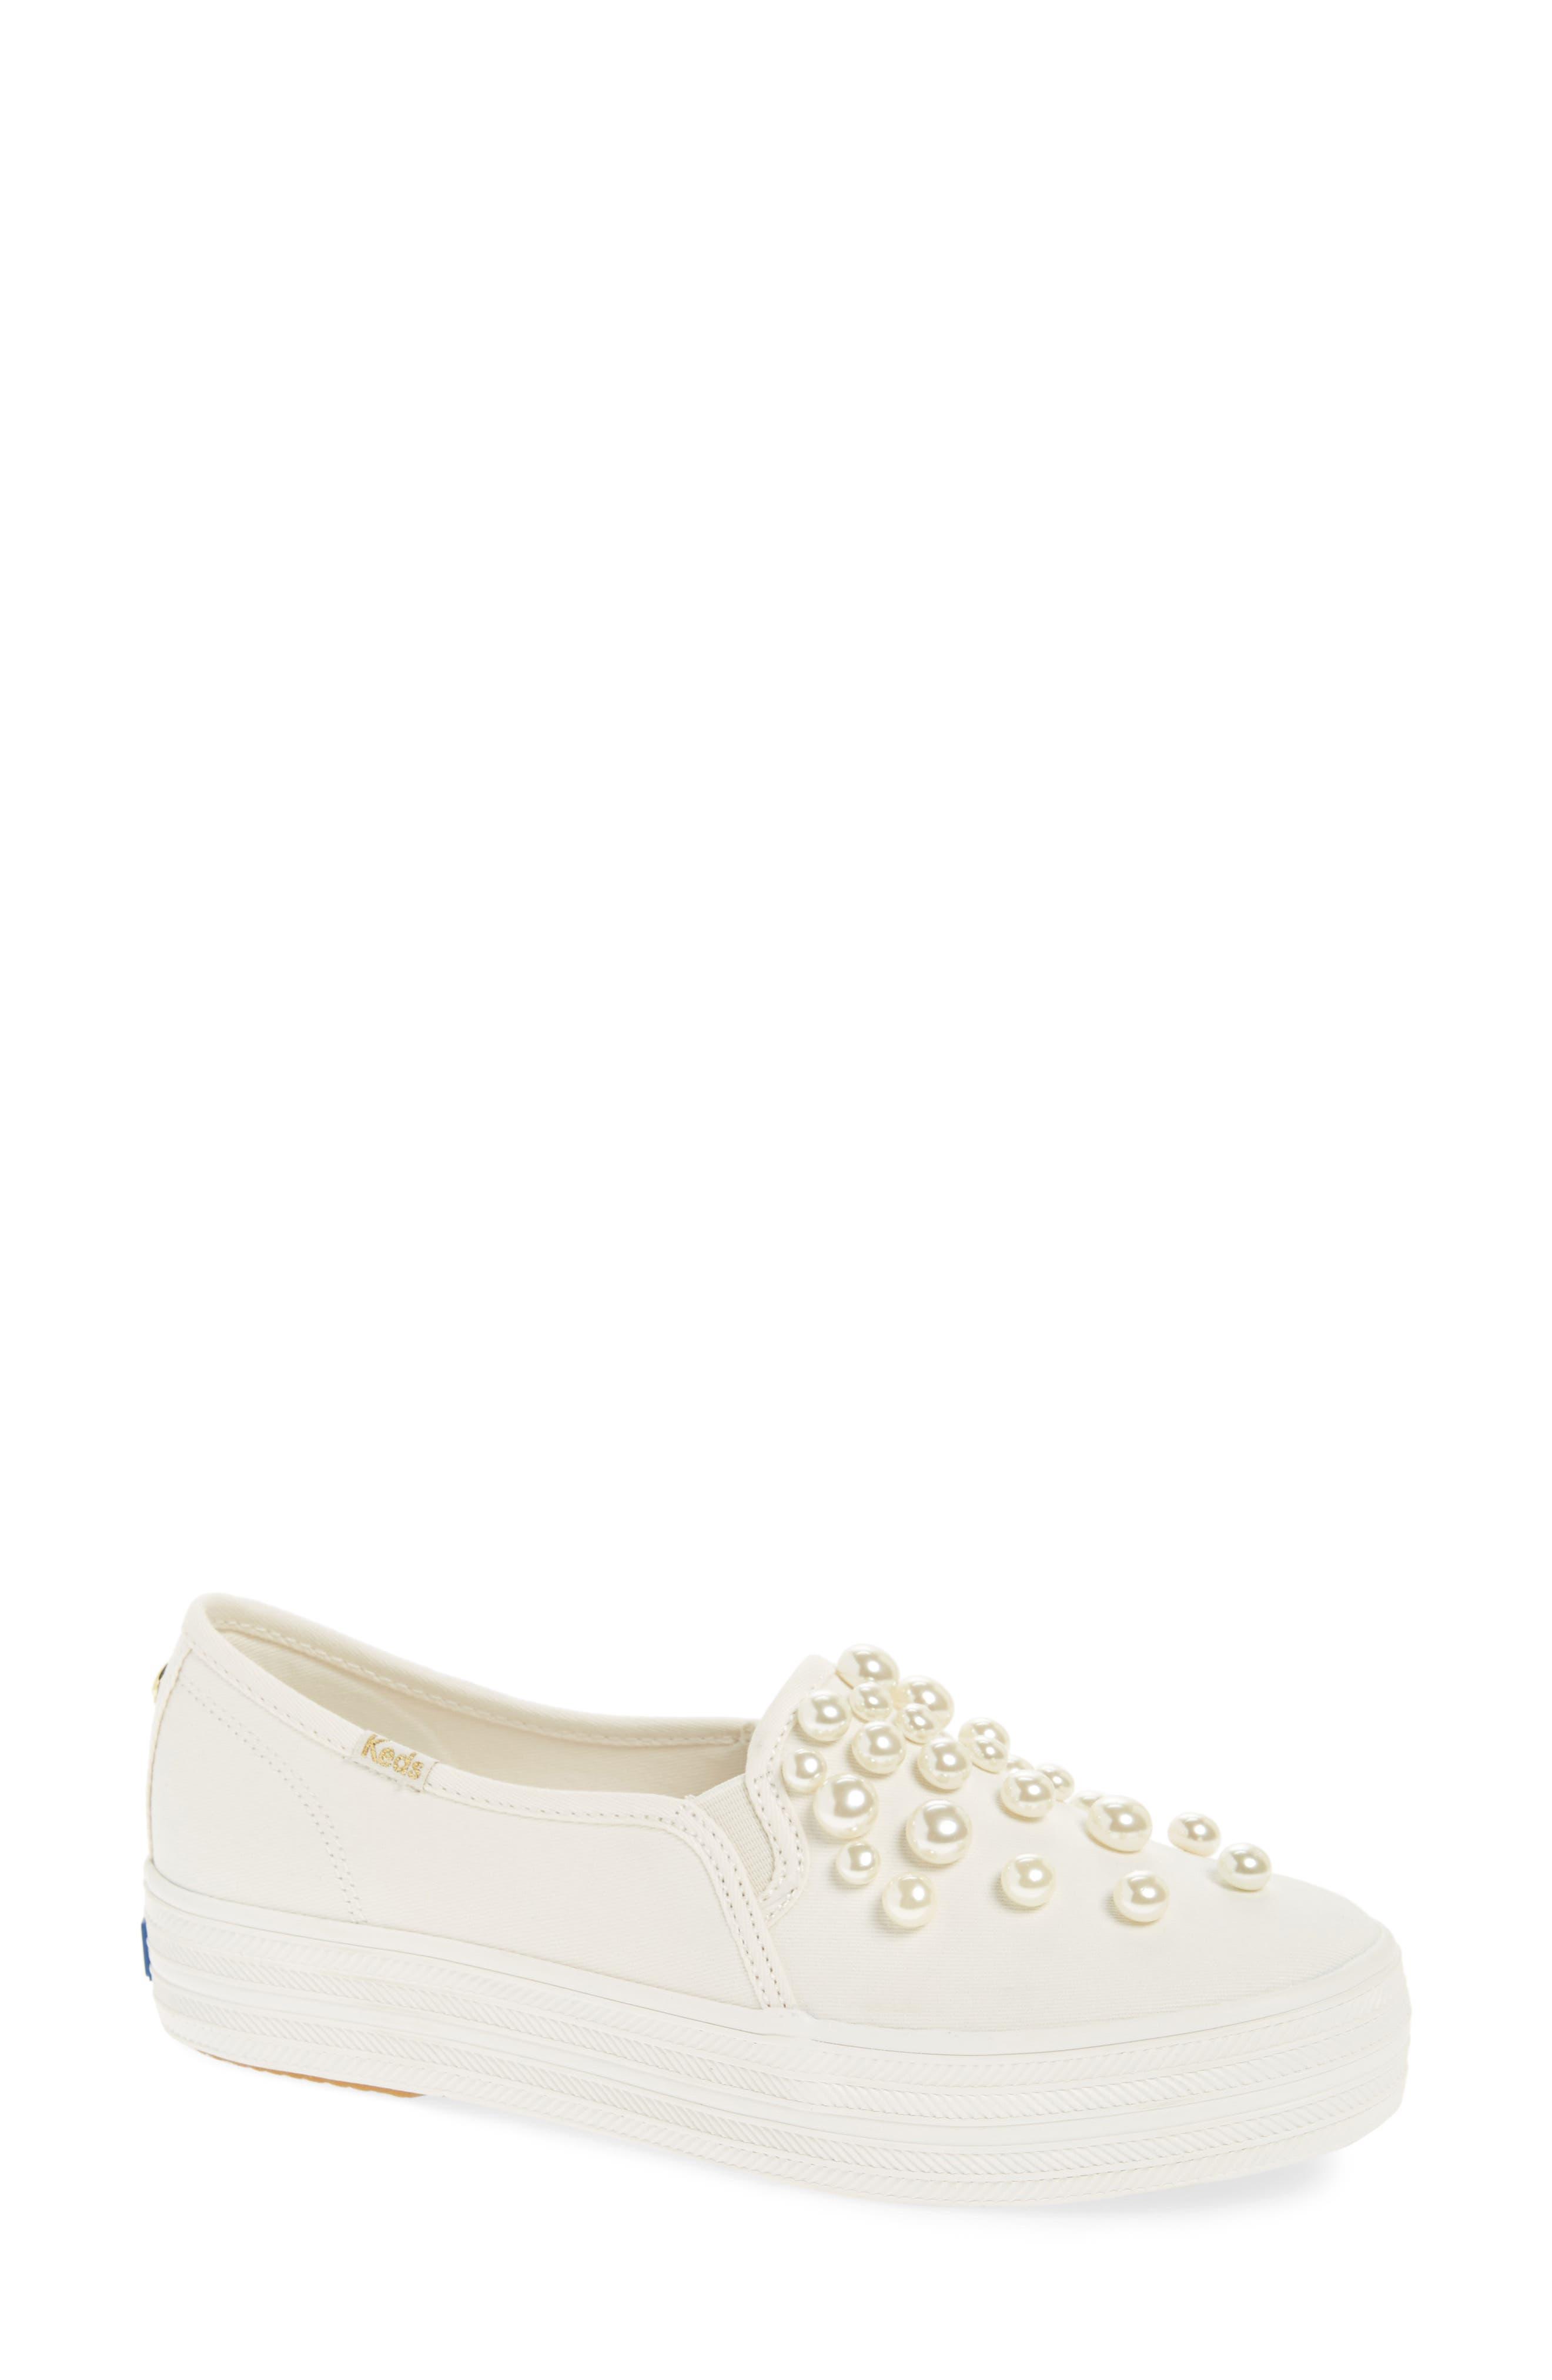 KEDS<SUP>®</SUP> FOR KATE SPADE NEW YORK triple decker embellished slip-on sneaker, Main, color, CREAM